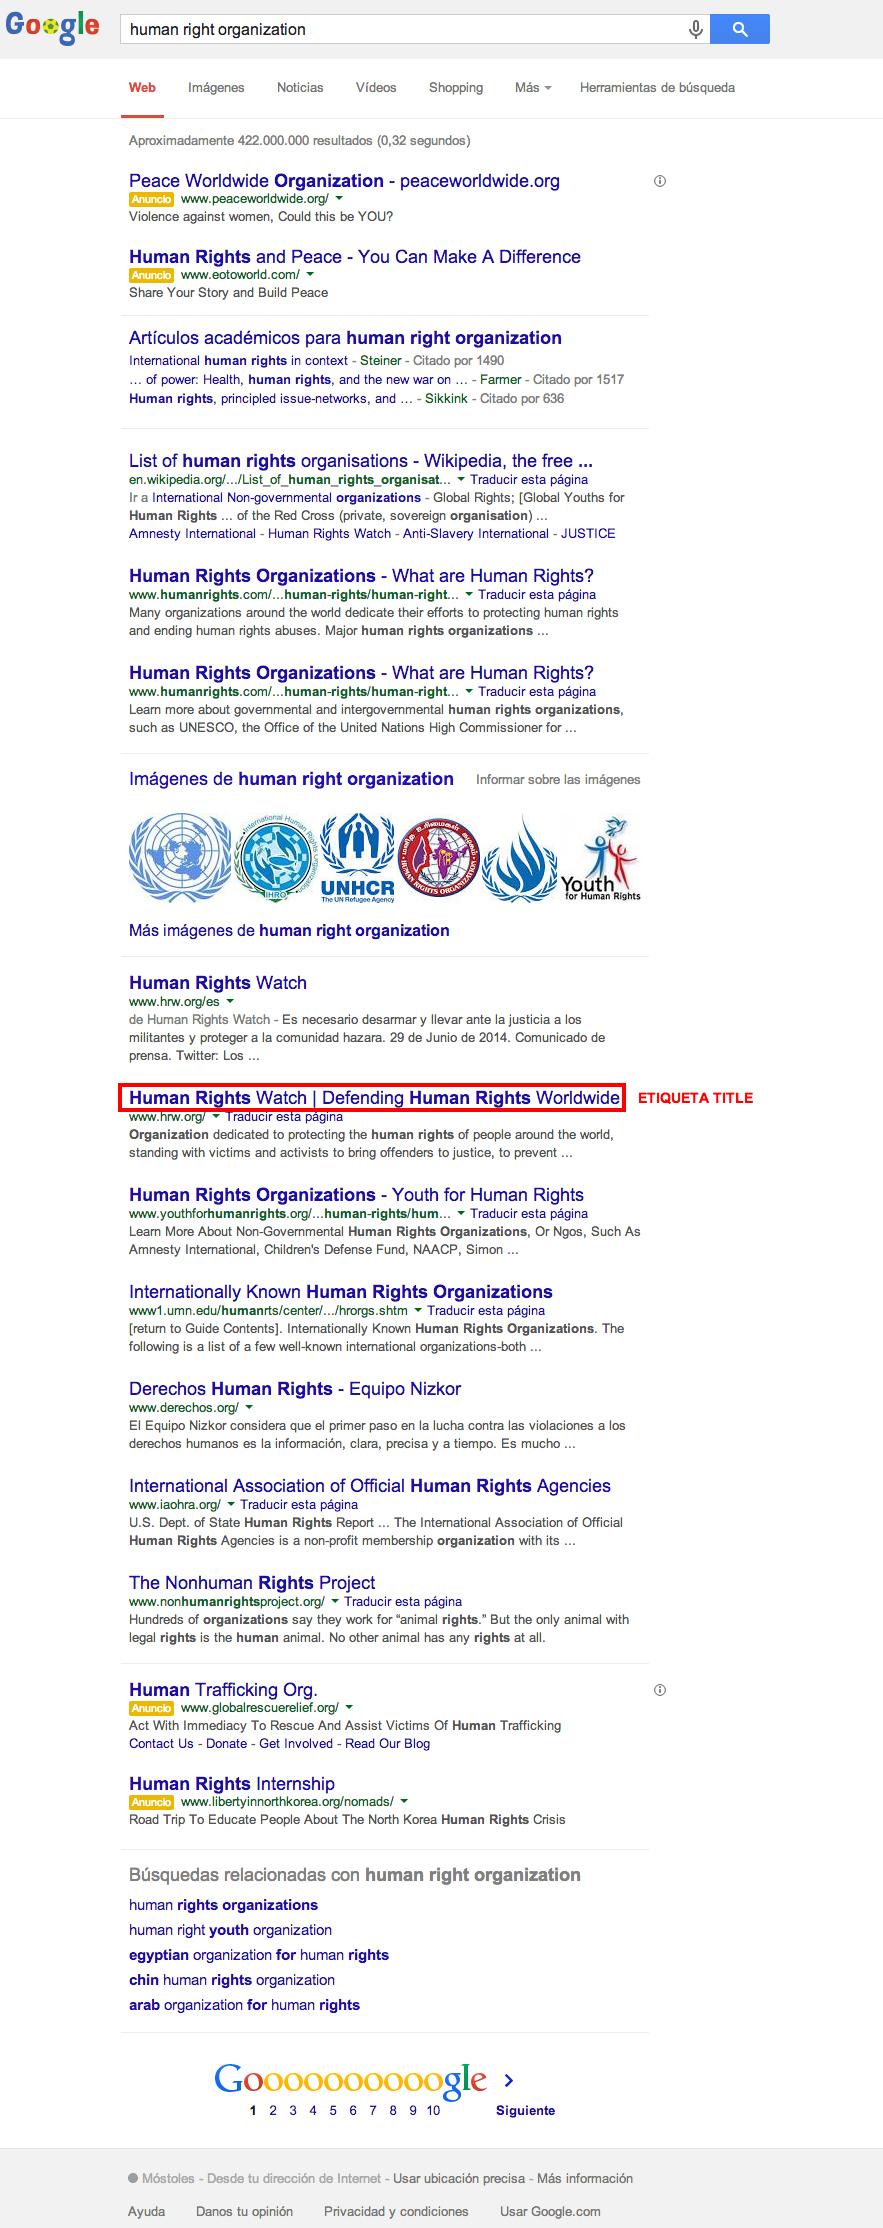 HRW-TITLE